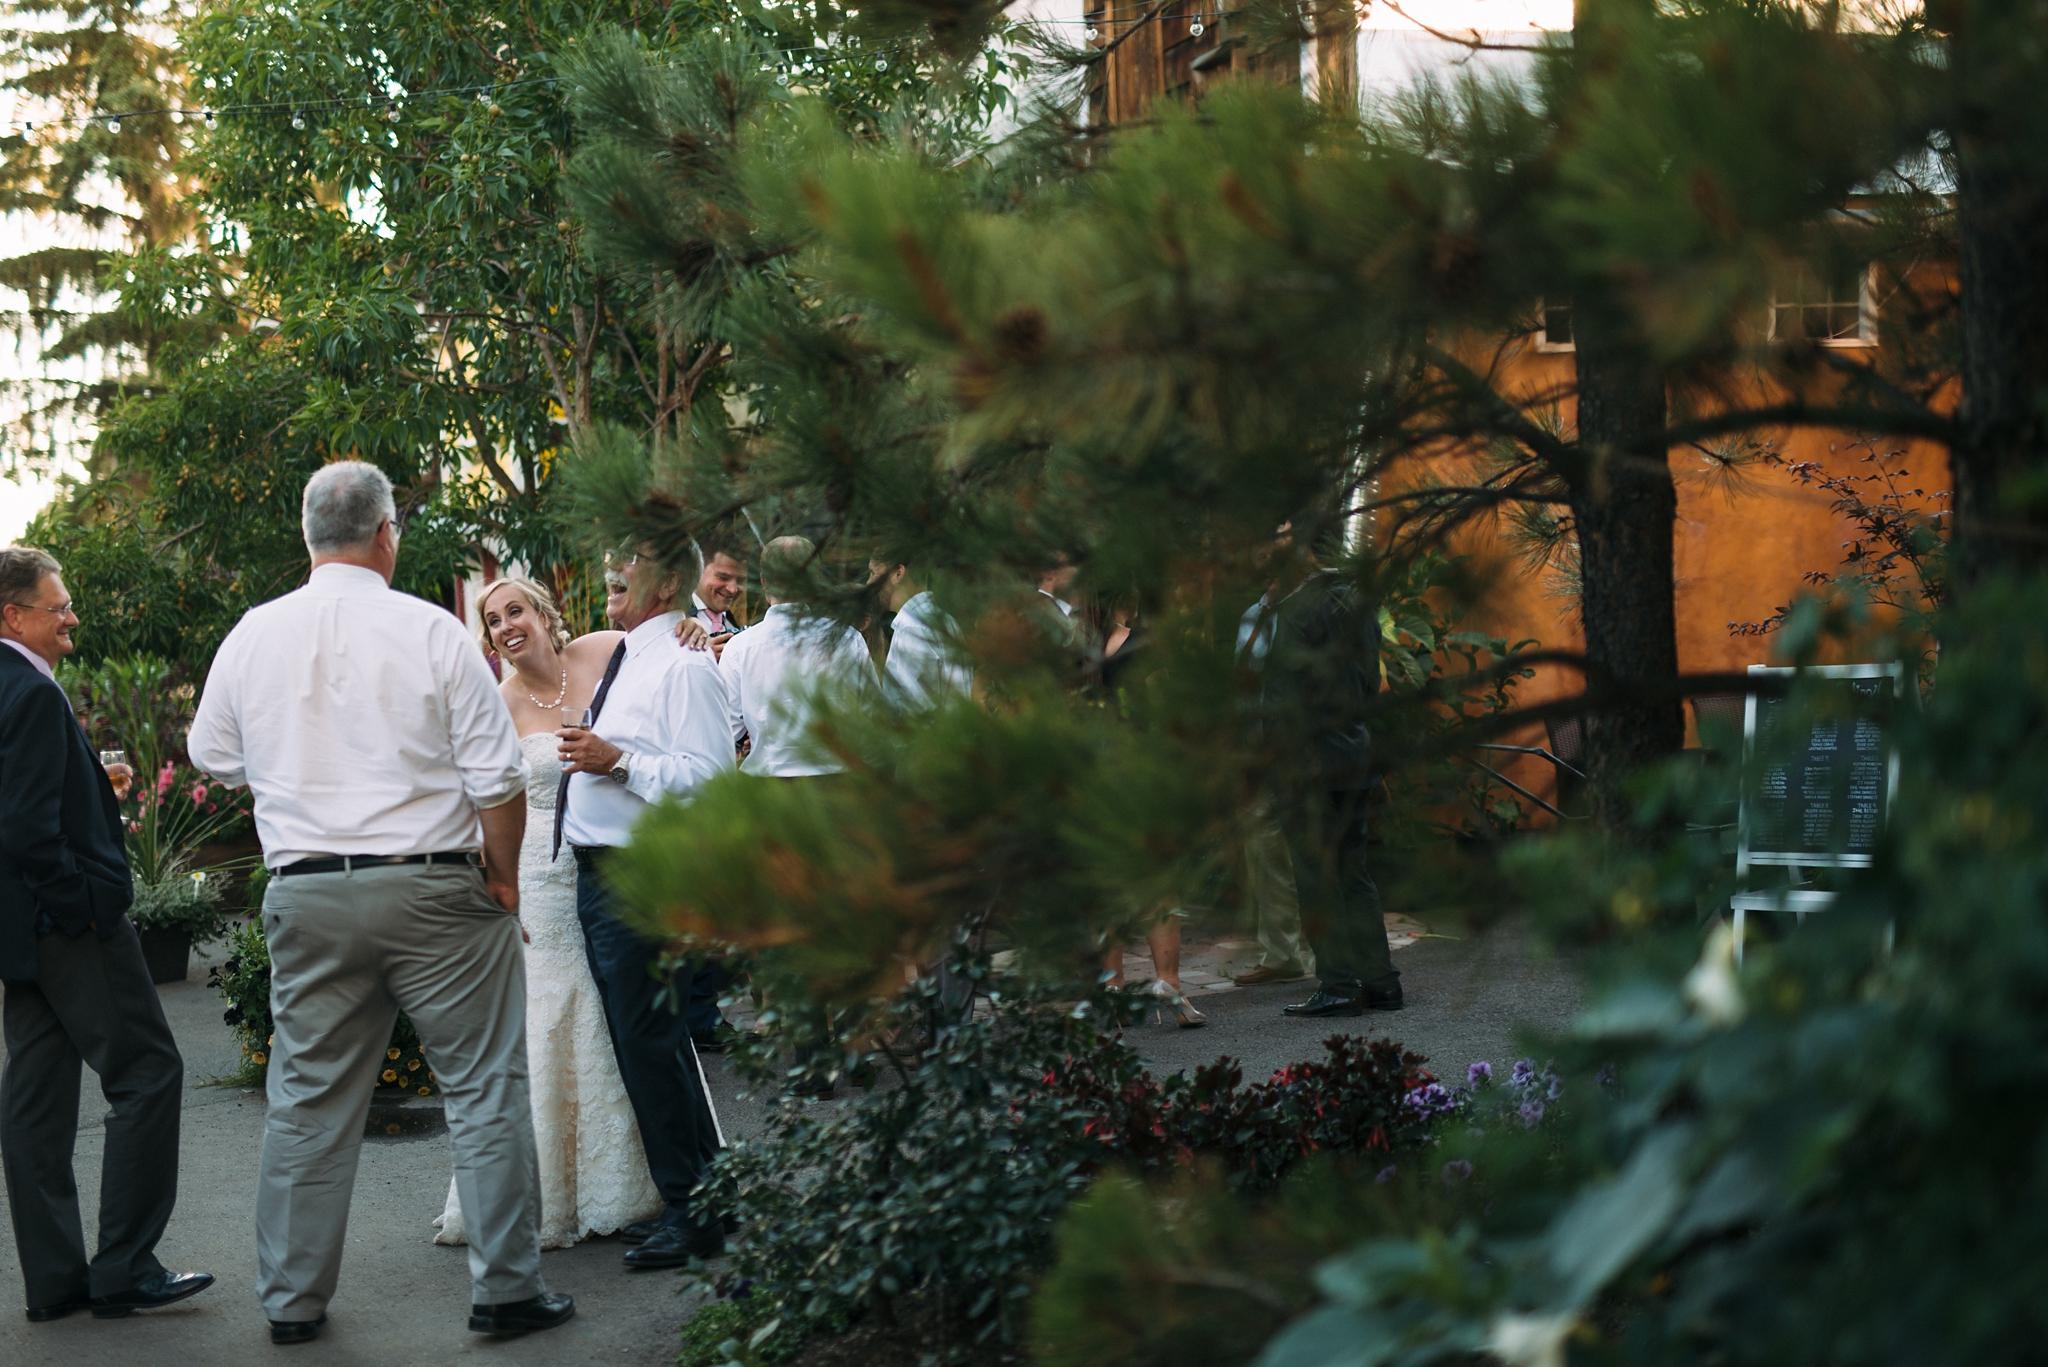 kaihla_tonai_intimate_wedding_elopement_photographer_4306